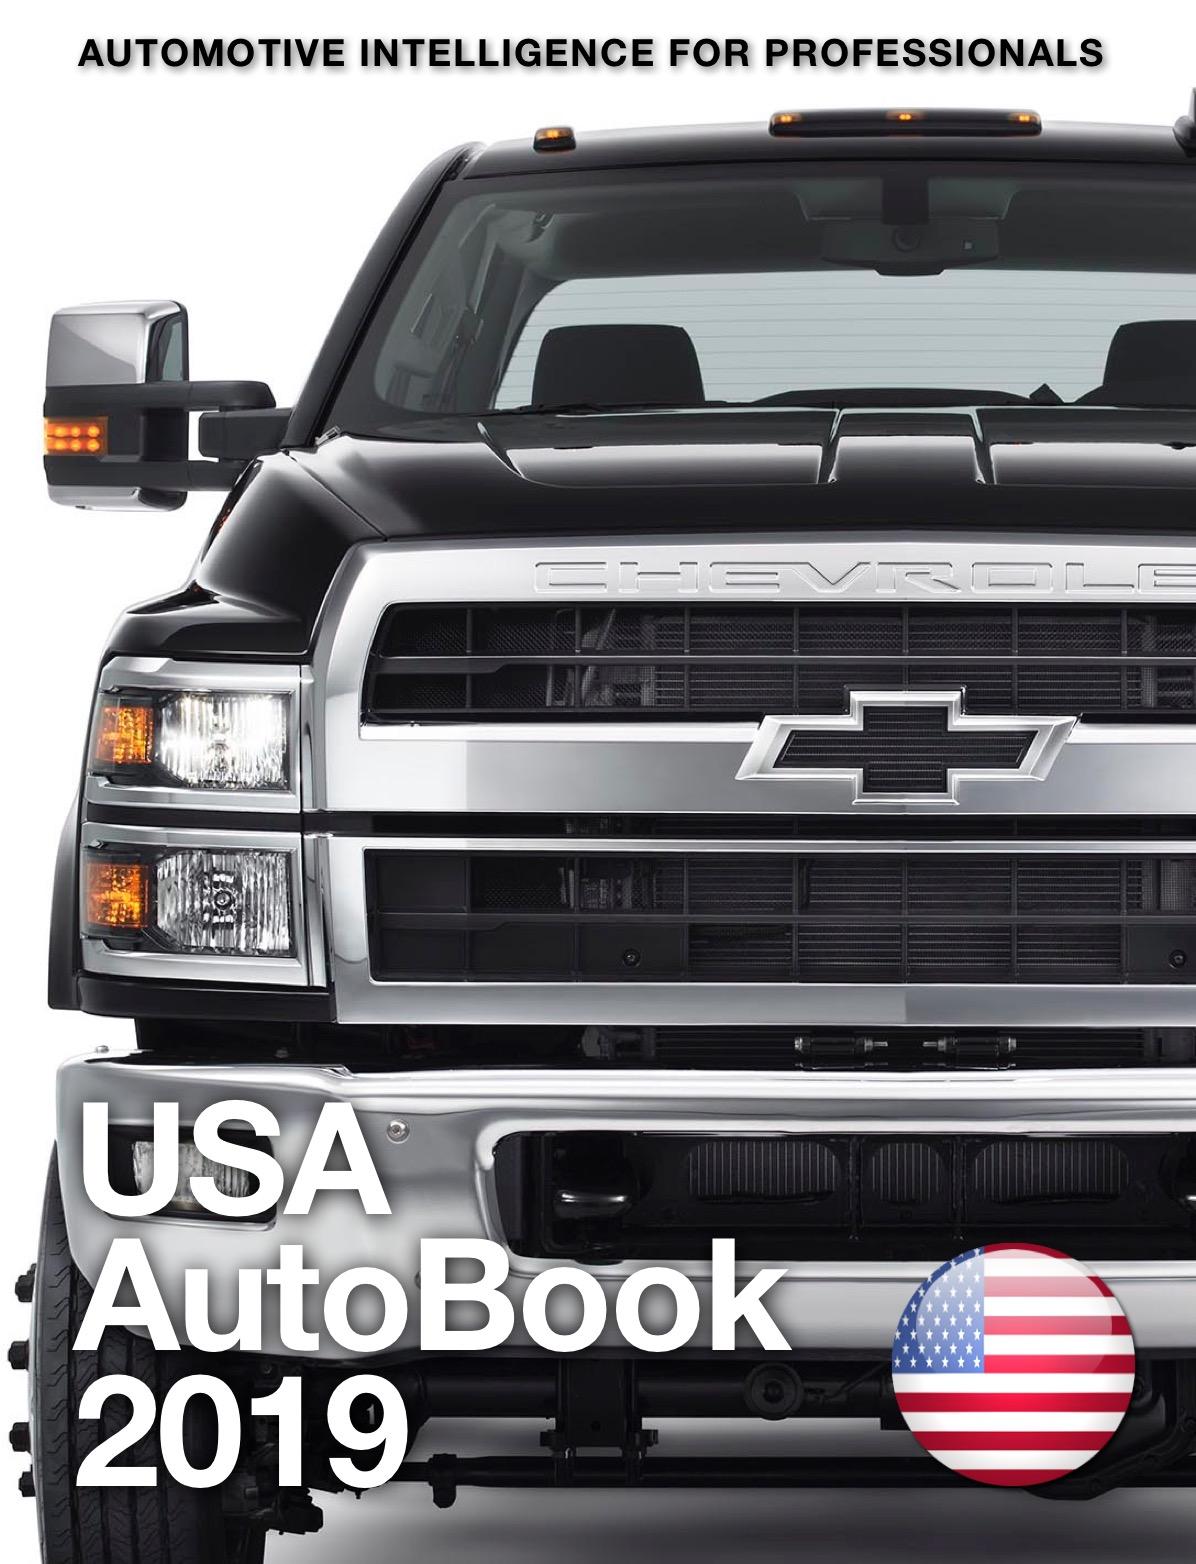 USA AutoBook 2019 Cover.jpg